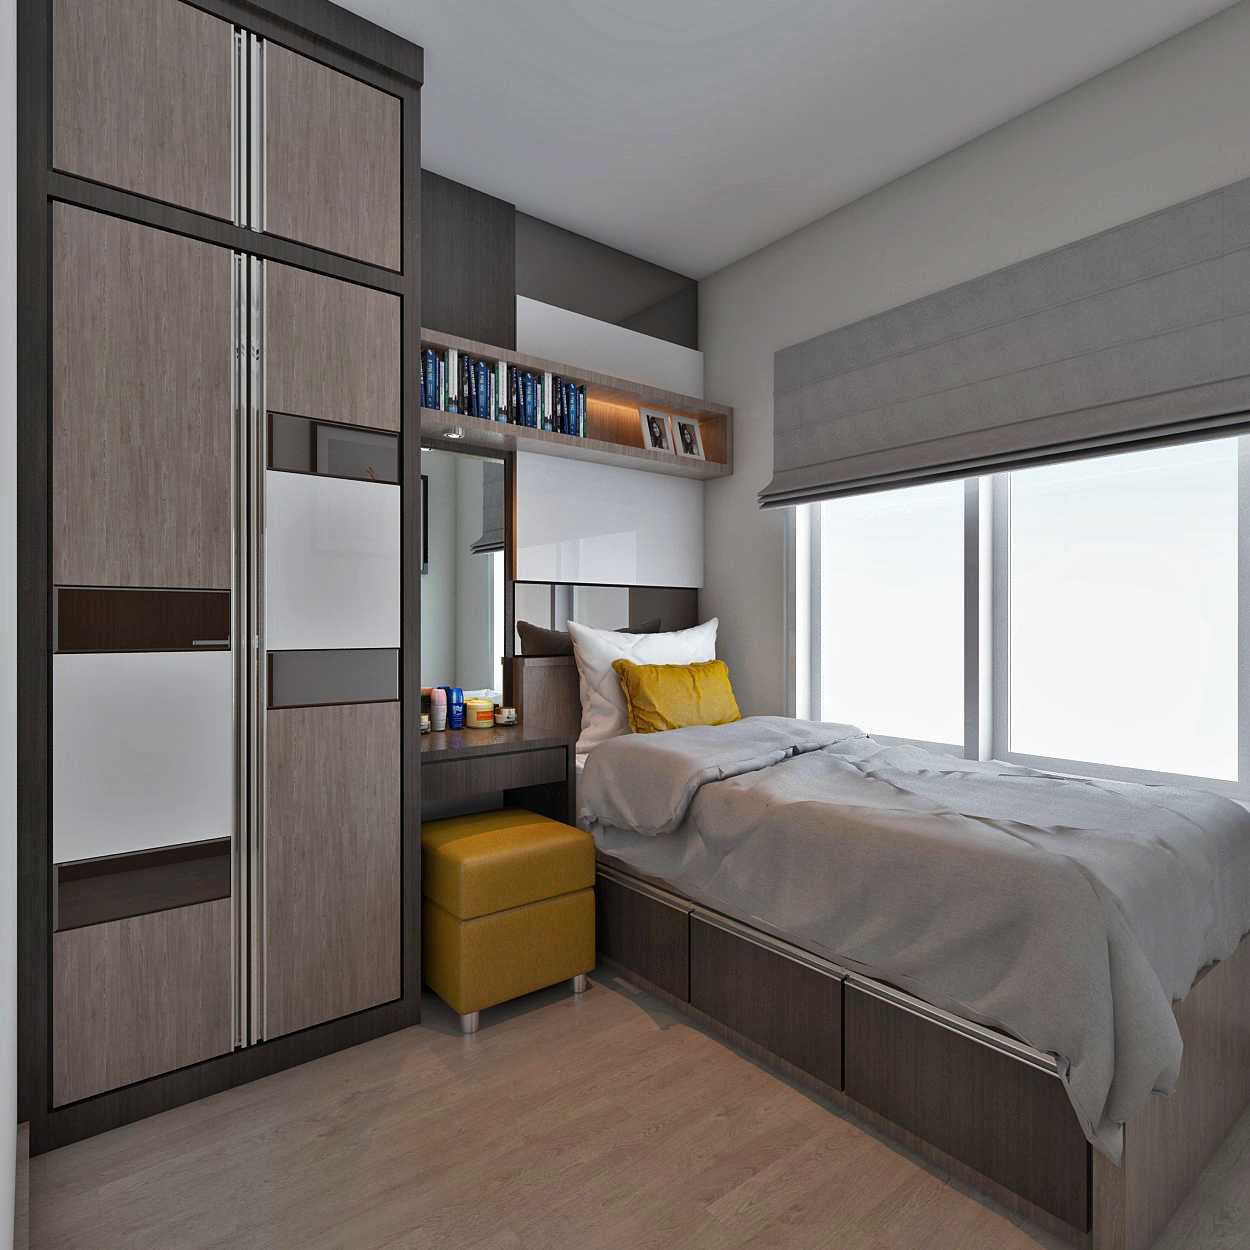 Habibullah Alfatih Condominium - Greenbay Pluit Jakarta, Indonesia Jakarta, Indonesia Kidroom-1 Kontemporer 35907